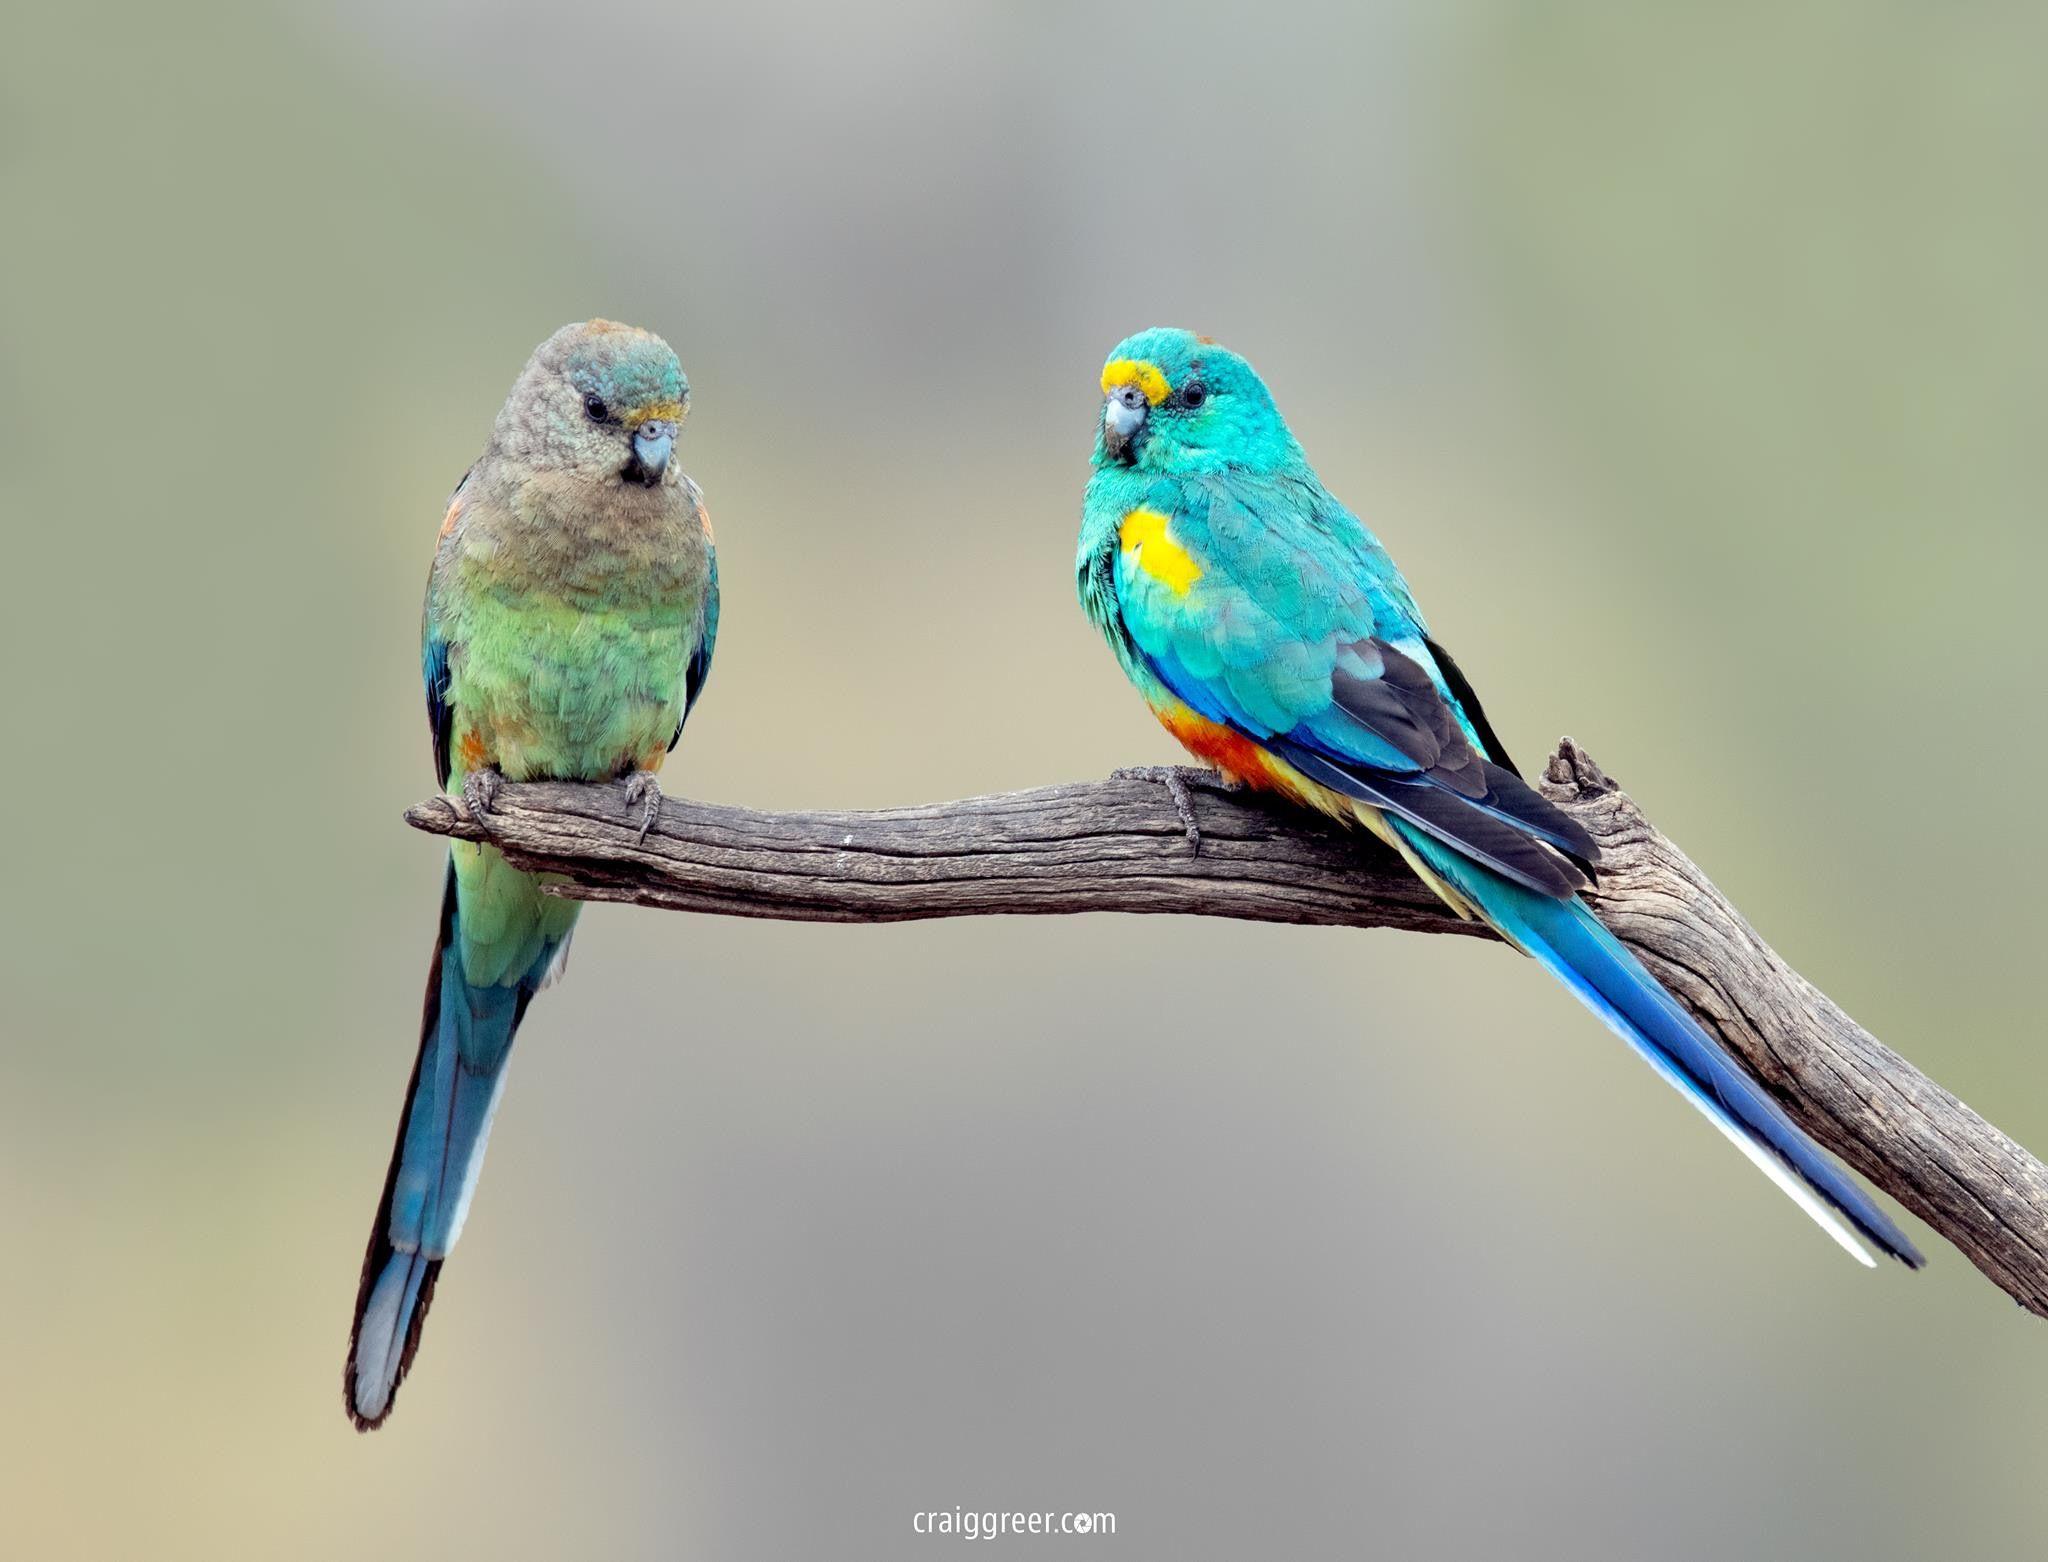 Mulga Parrot Pair With Images Beautiful Birds Birds